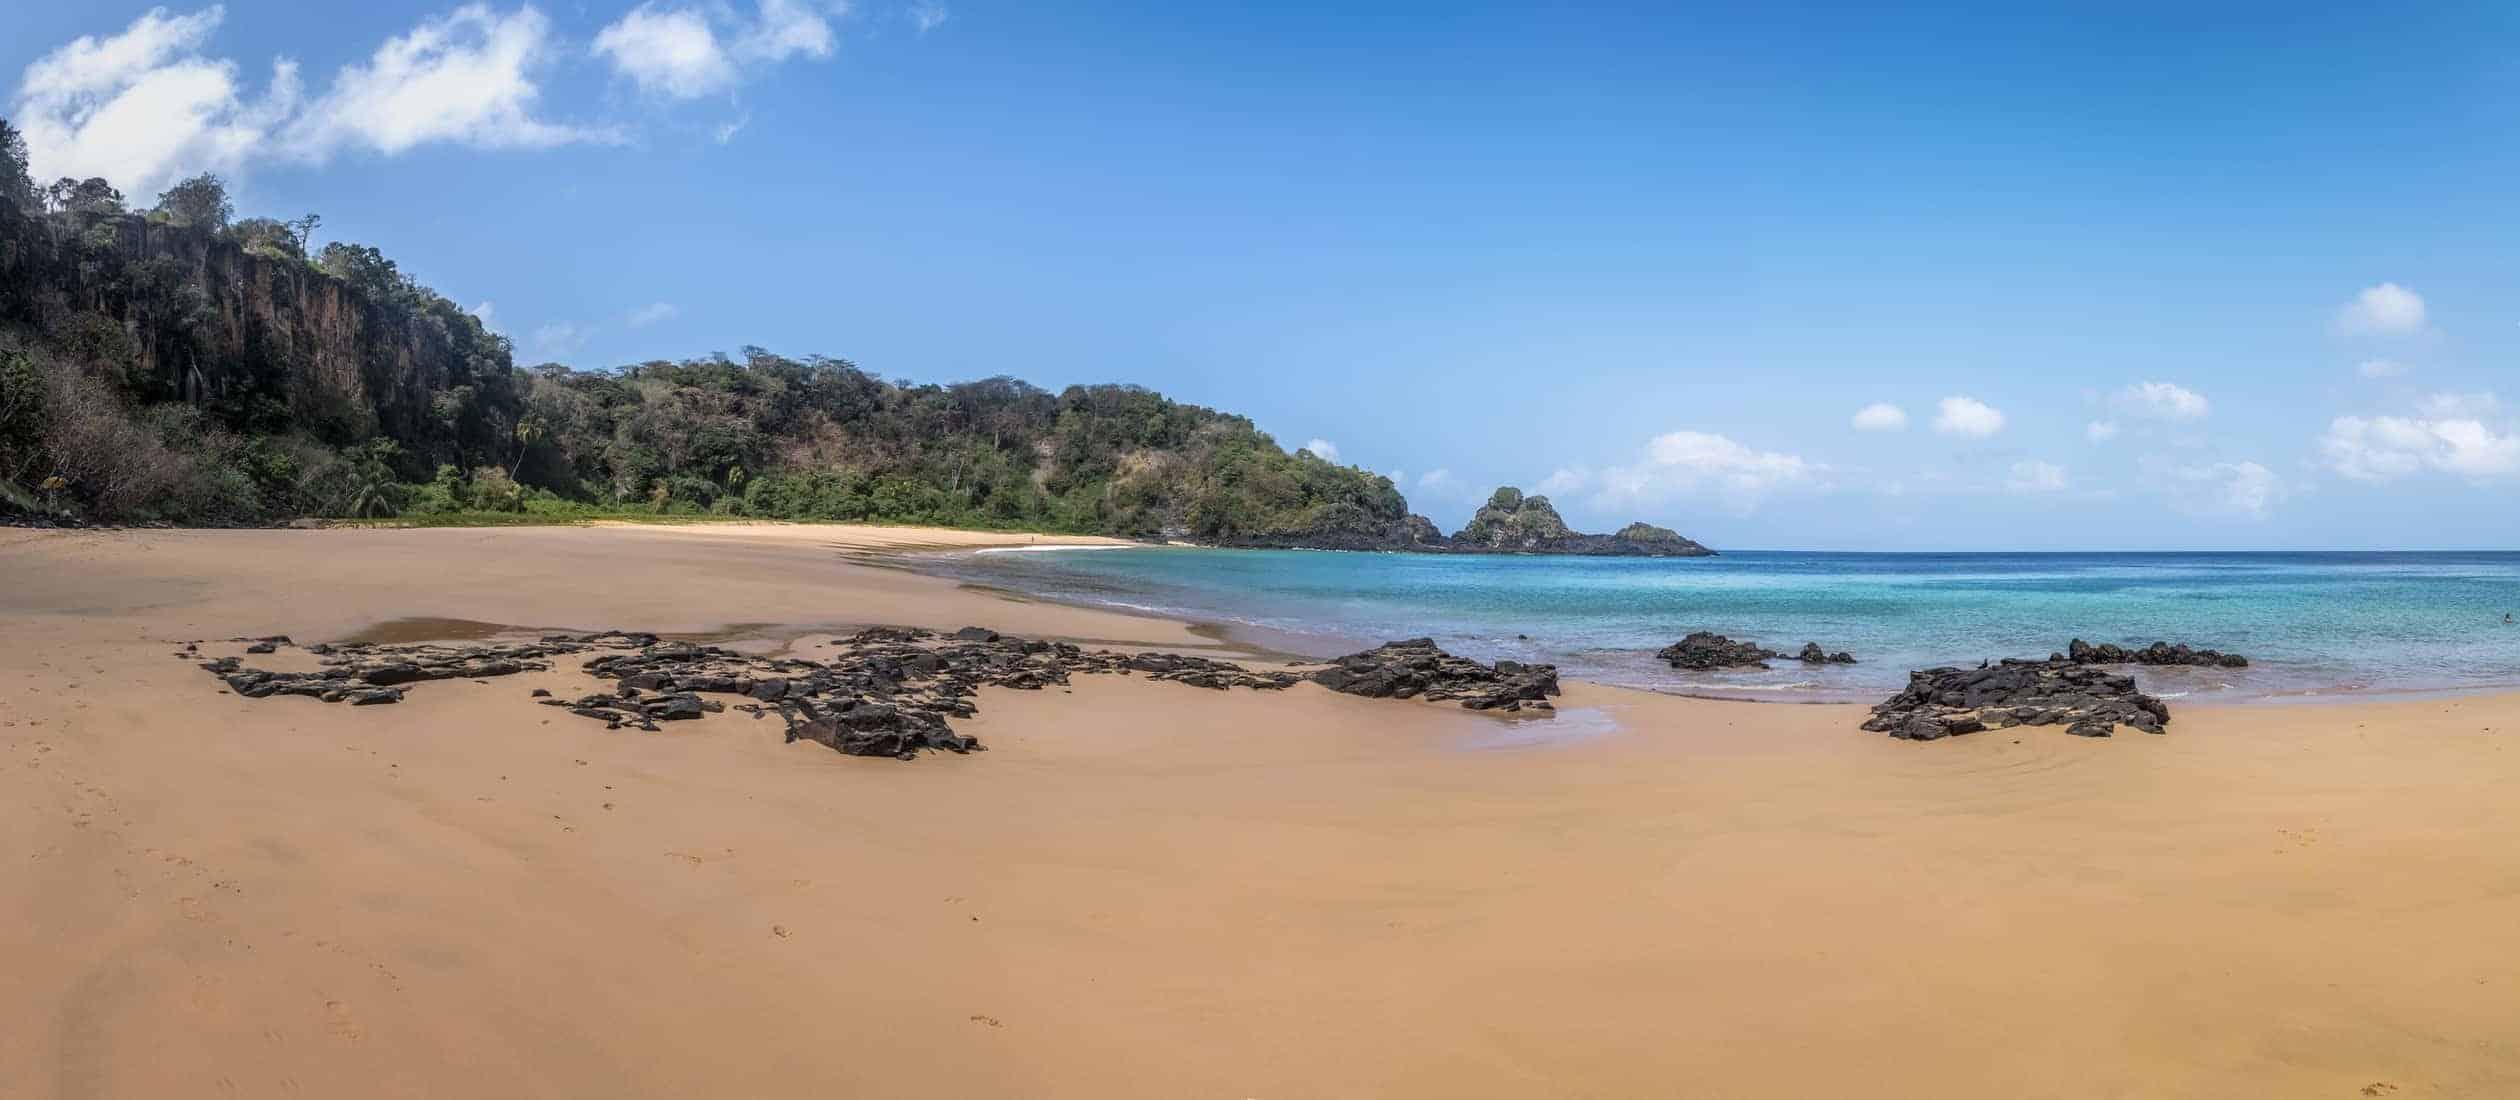 Panoramic view of Praia do Sancho Beach - Fernando de Noronha, Pernambuco, Brazil